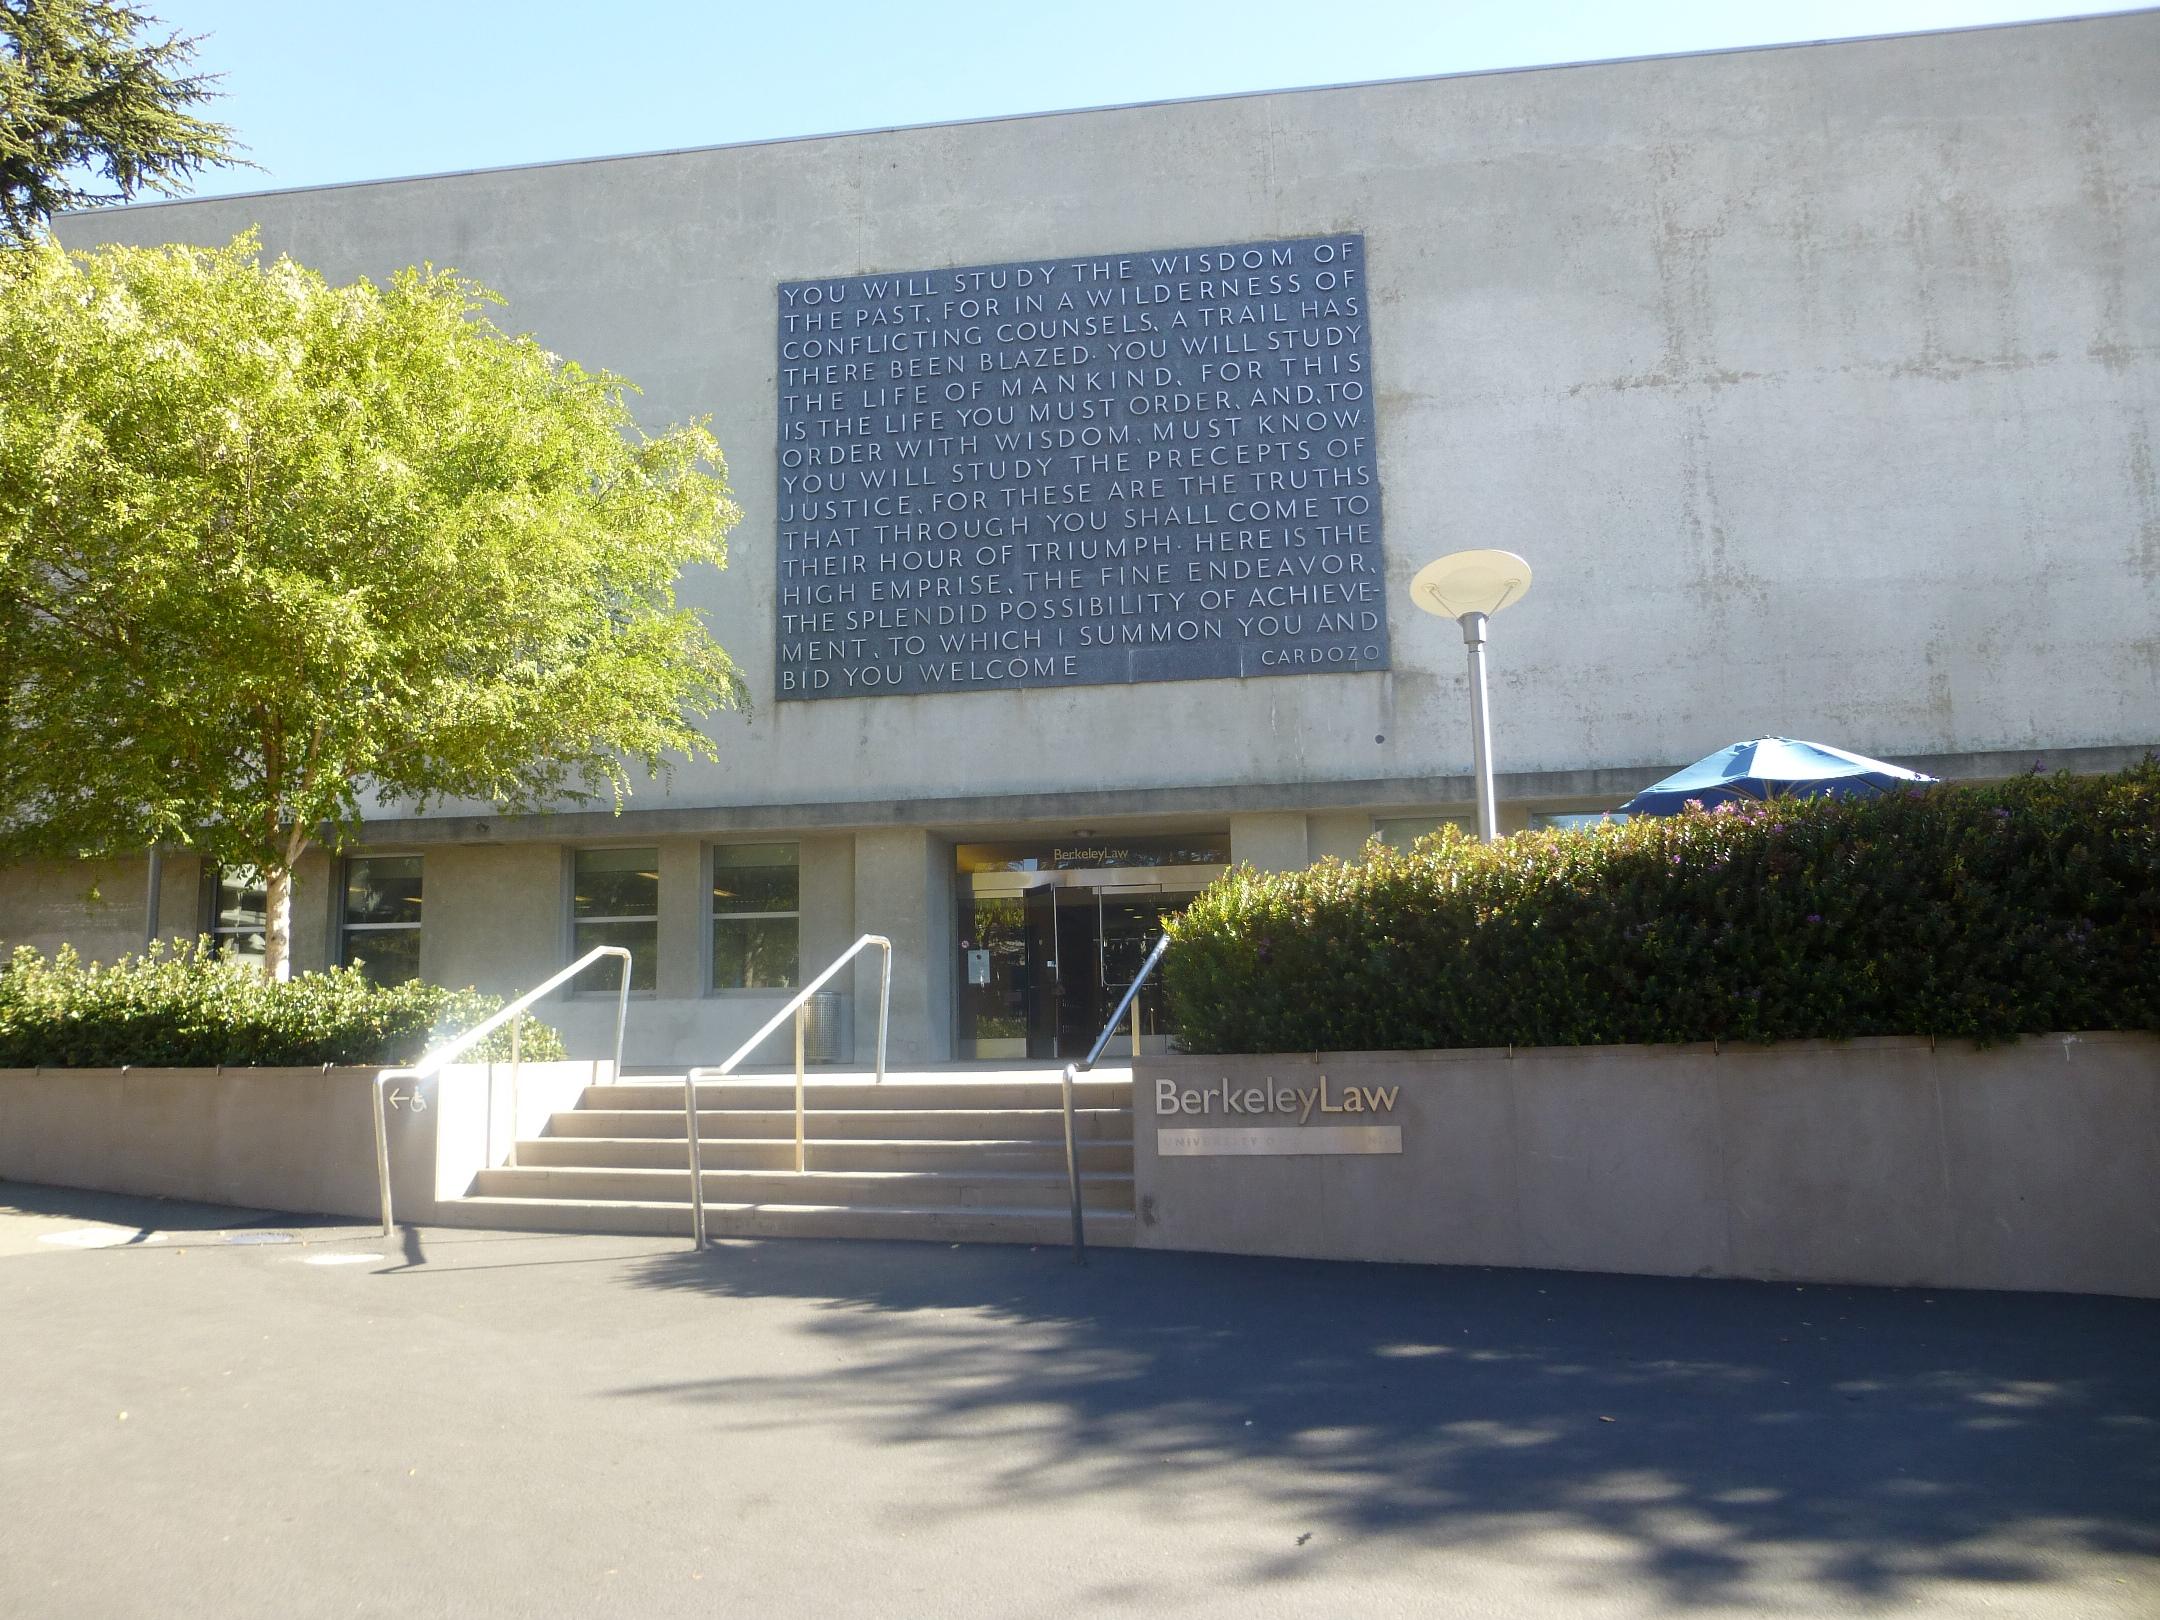 University of California at Berkeley(November 2015)